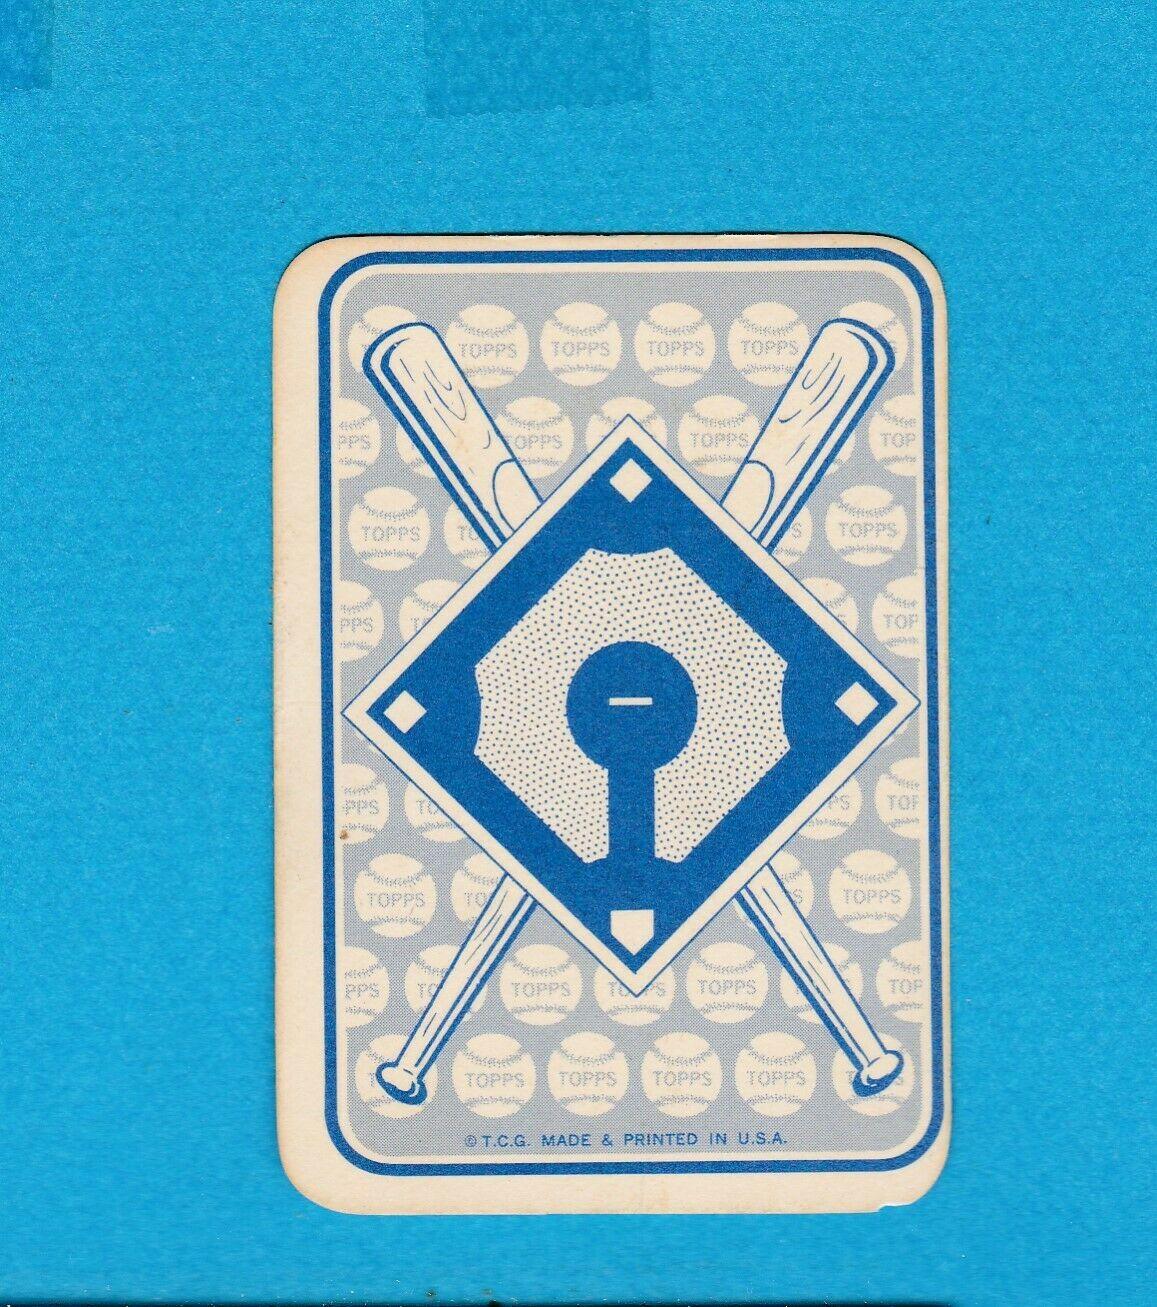 1968 TOPPS BASEBALL SET BREAK GAME CARD 2 MICKEY MANTLE VG+ - Image 2